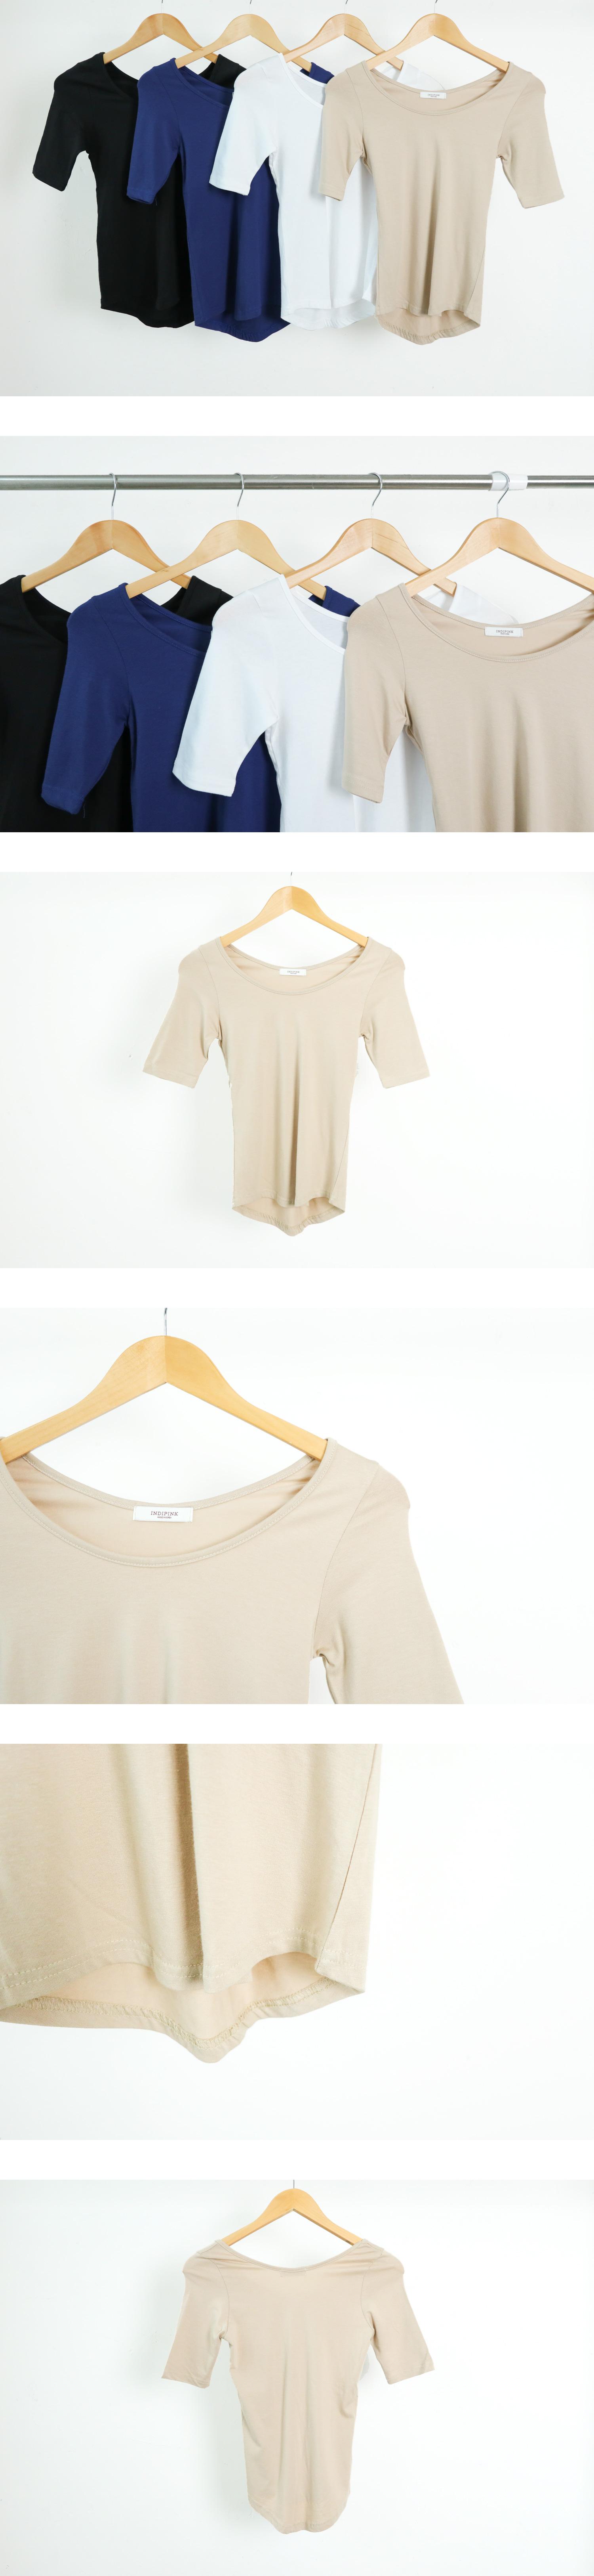 Colmiyu Round Short-sleeved T-shirt